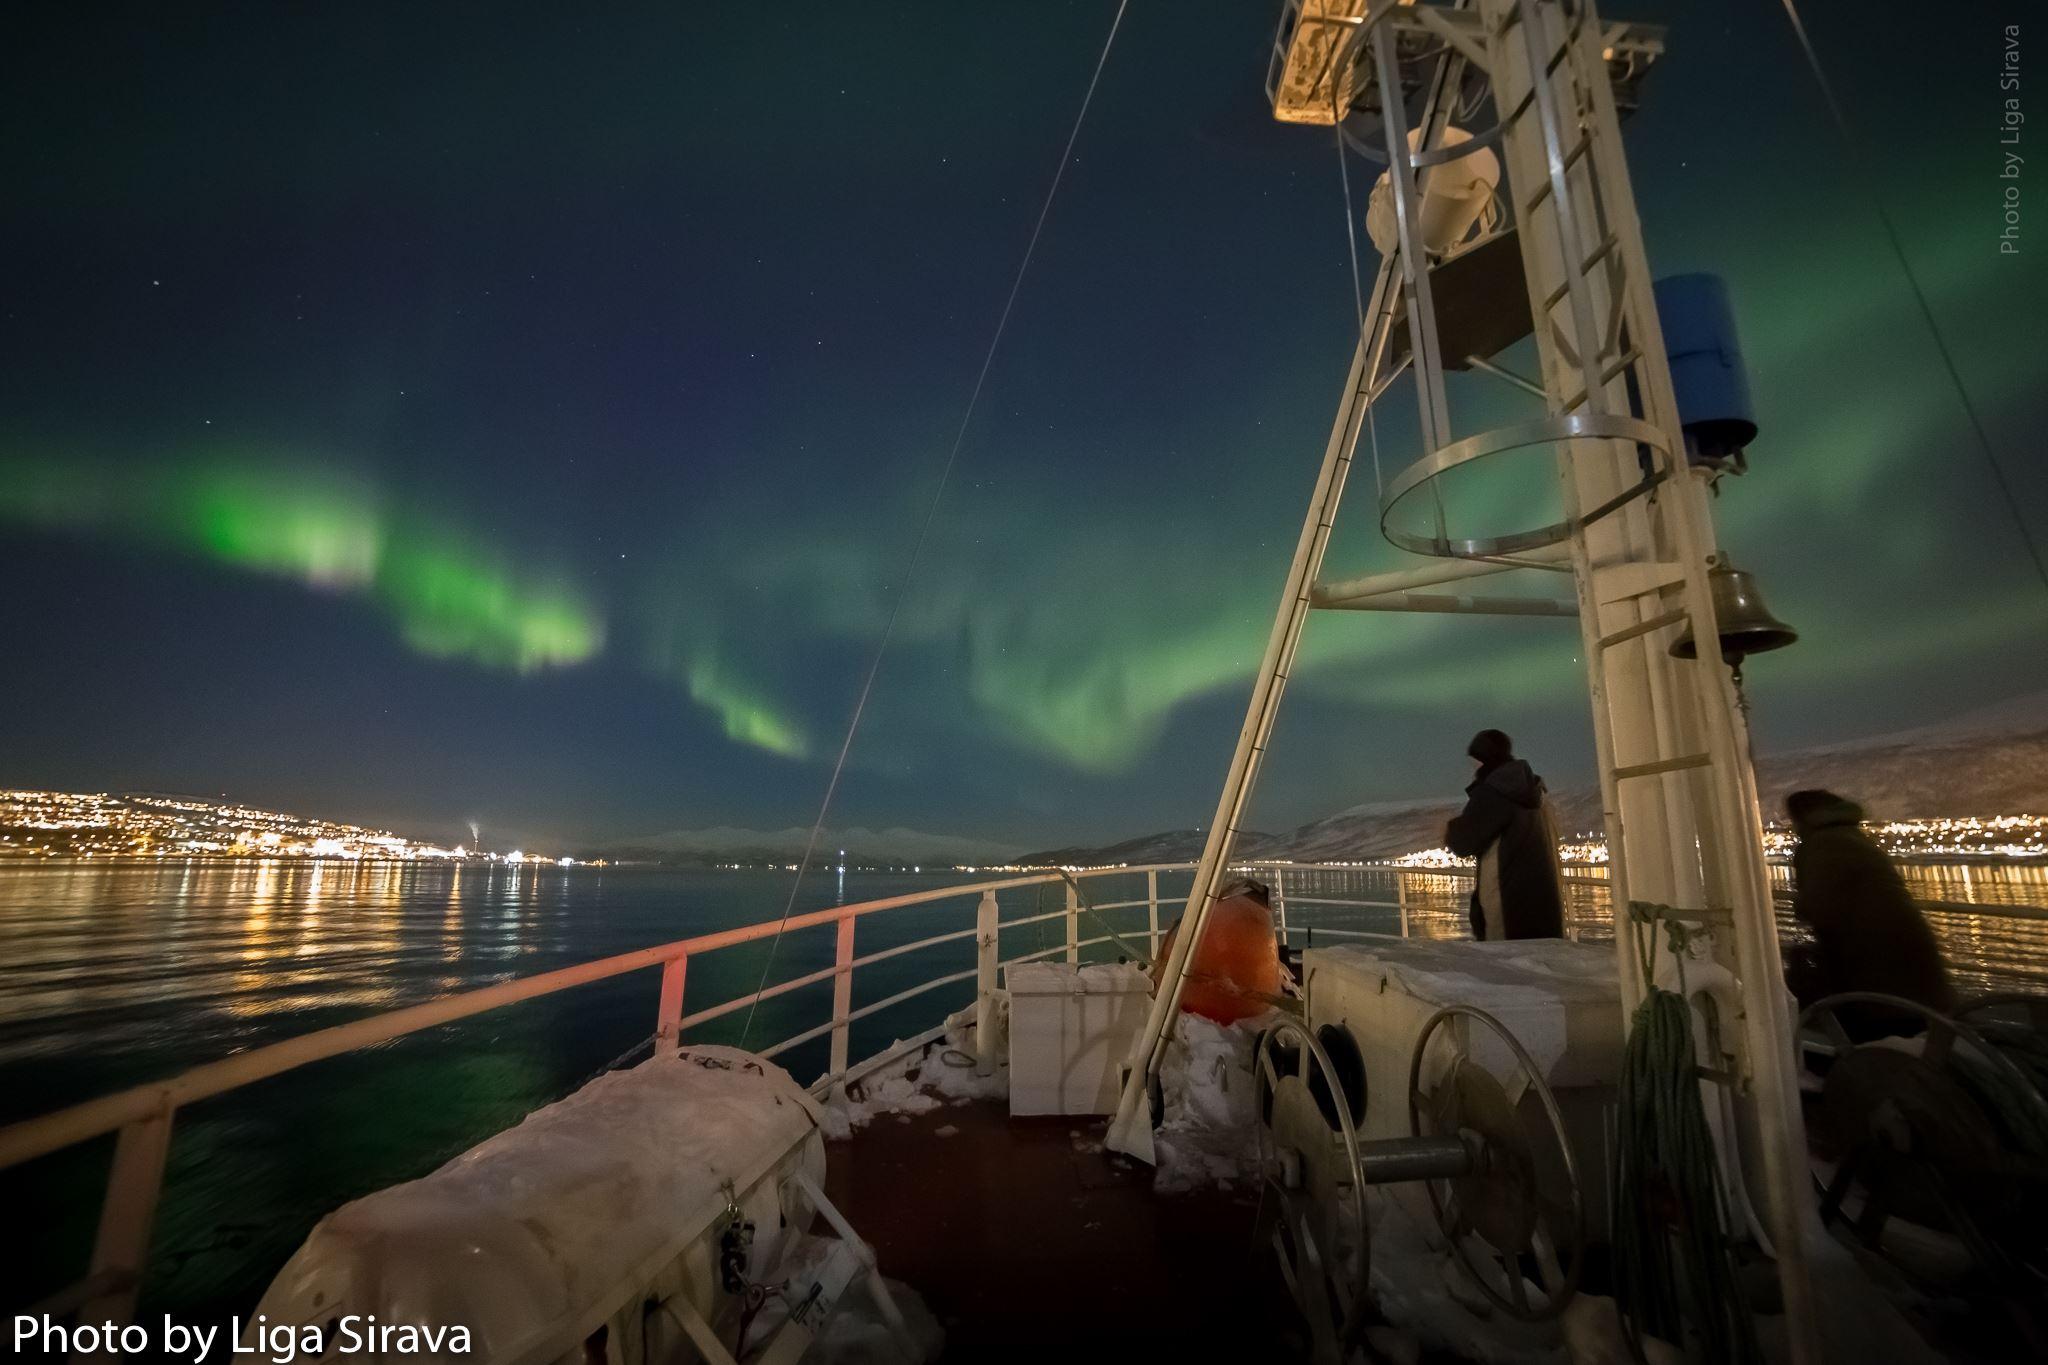 Aurora Cruise